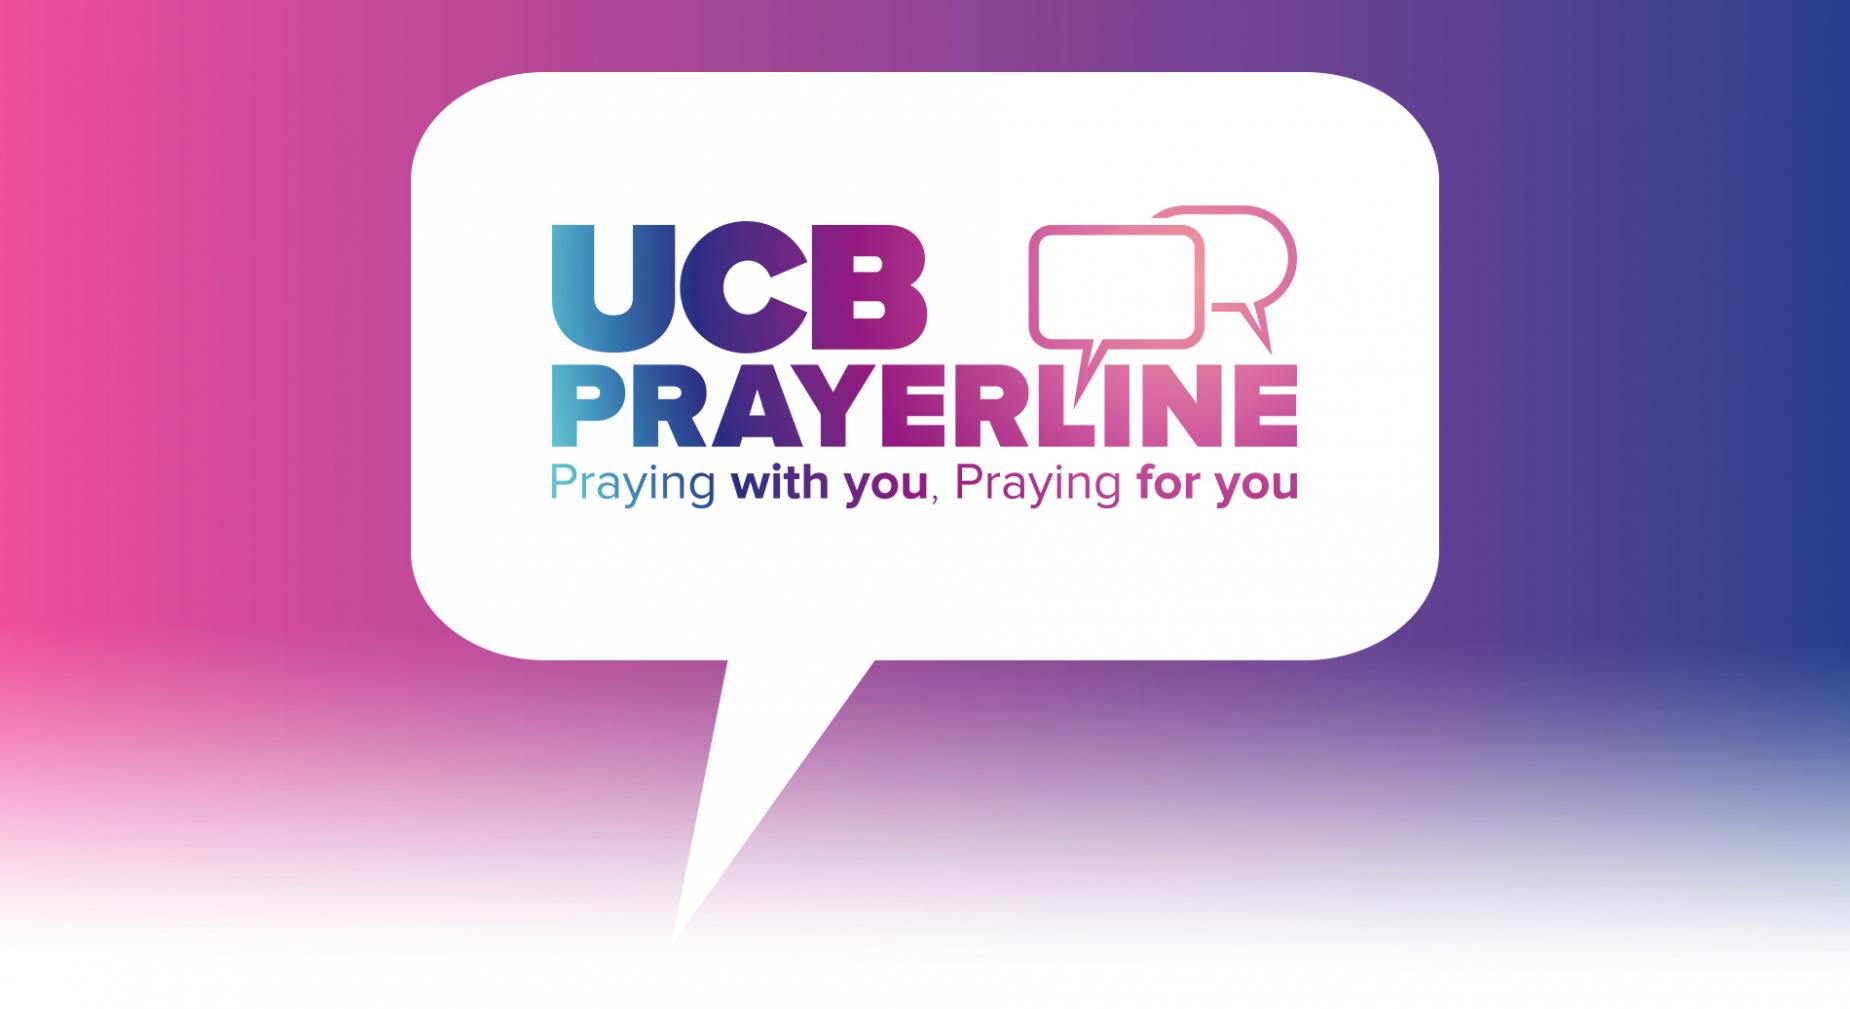 UCB Prayerline : Praying with you, praying for you